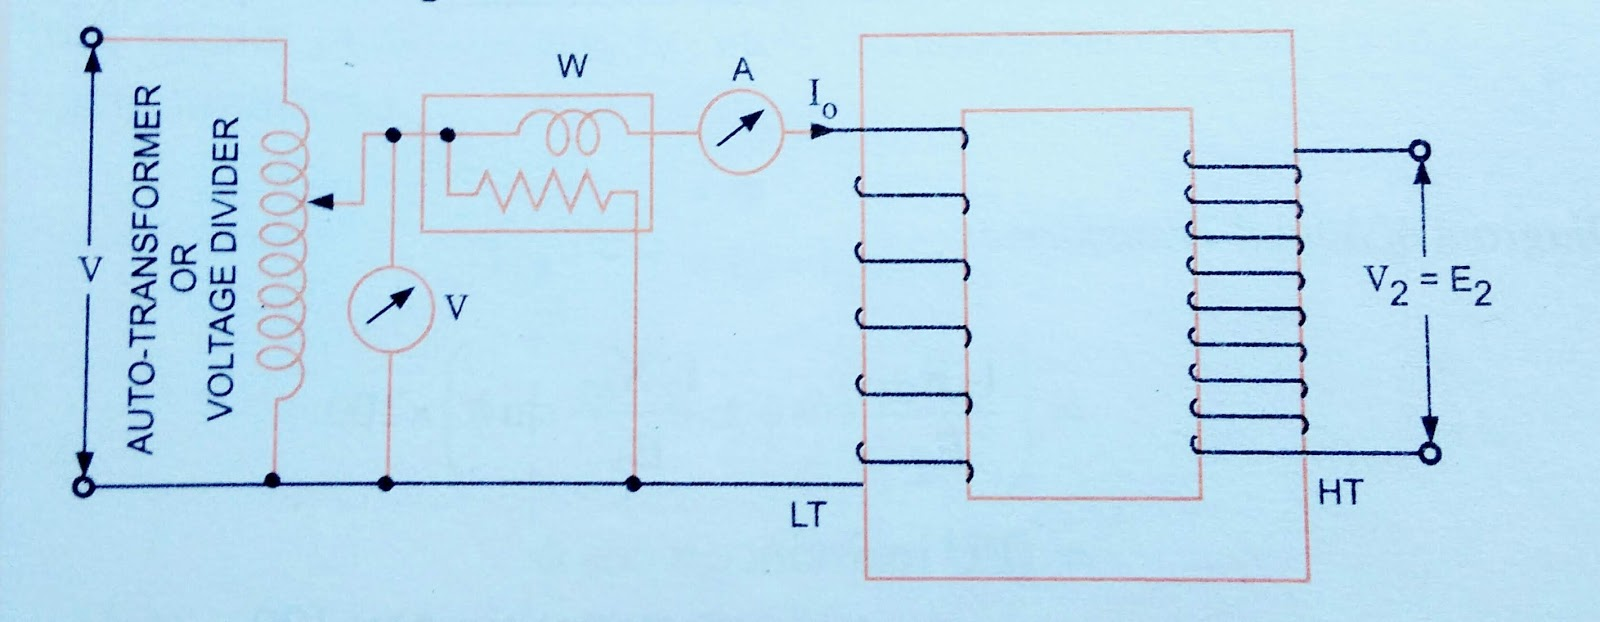 CKT diagram for Open-circuit Test